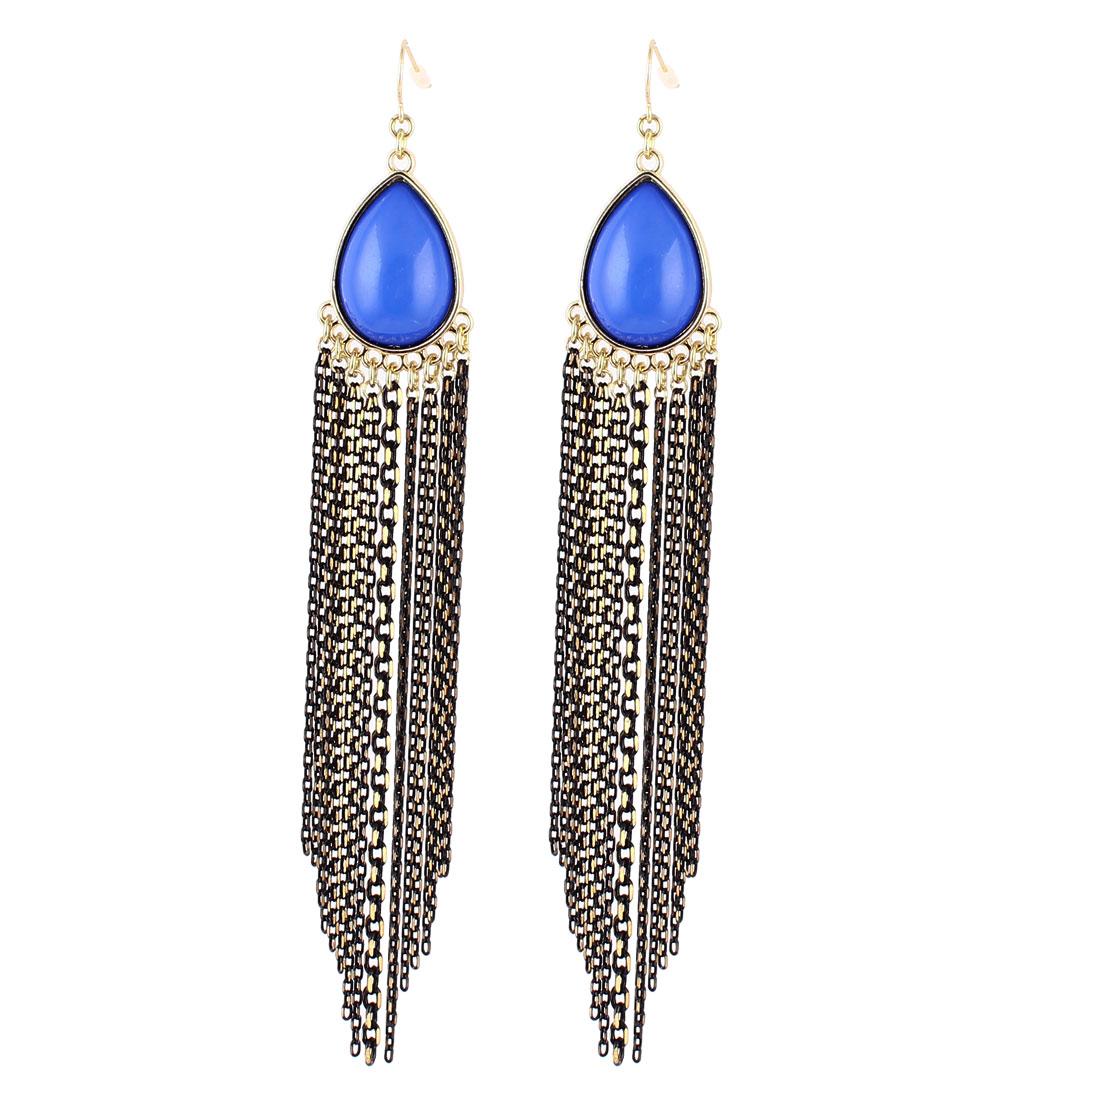 "Woman Black Blue Plastic Rhinestone Chain Tassels Design Dangling Pendant Metal Fish Hook Earrings Earbob Gold Tone 6.1"" Length Pair"